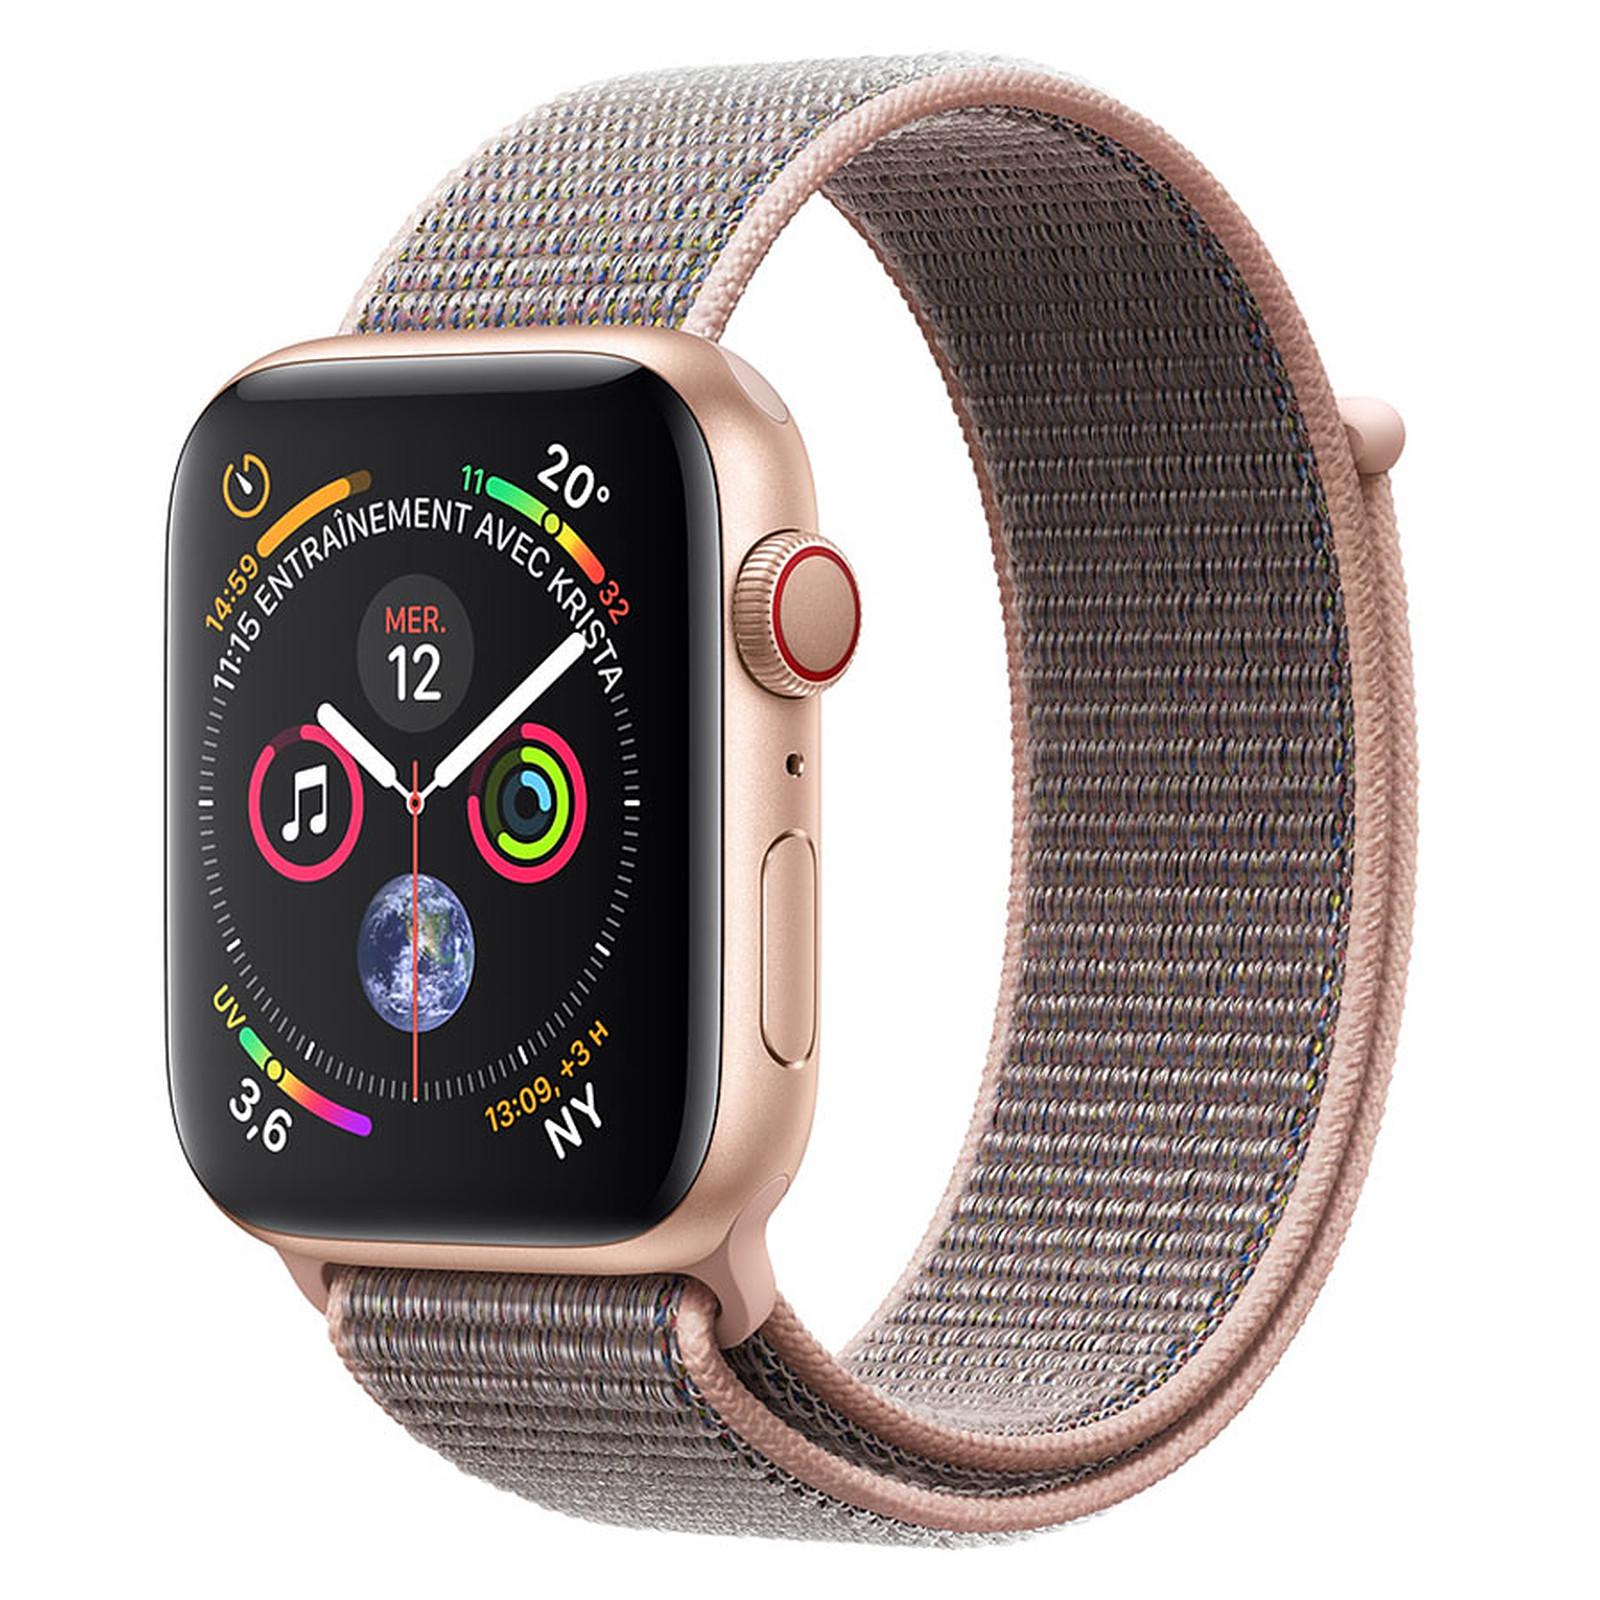 Apple Watch Serie 4 GPS + Aluminio Celular Oro 44 mm Hebilla Deportiva Rosa